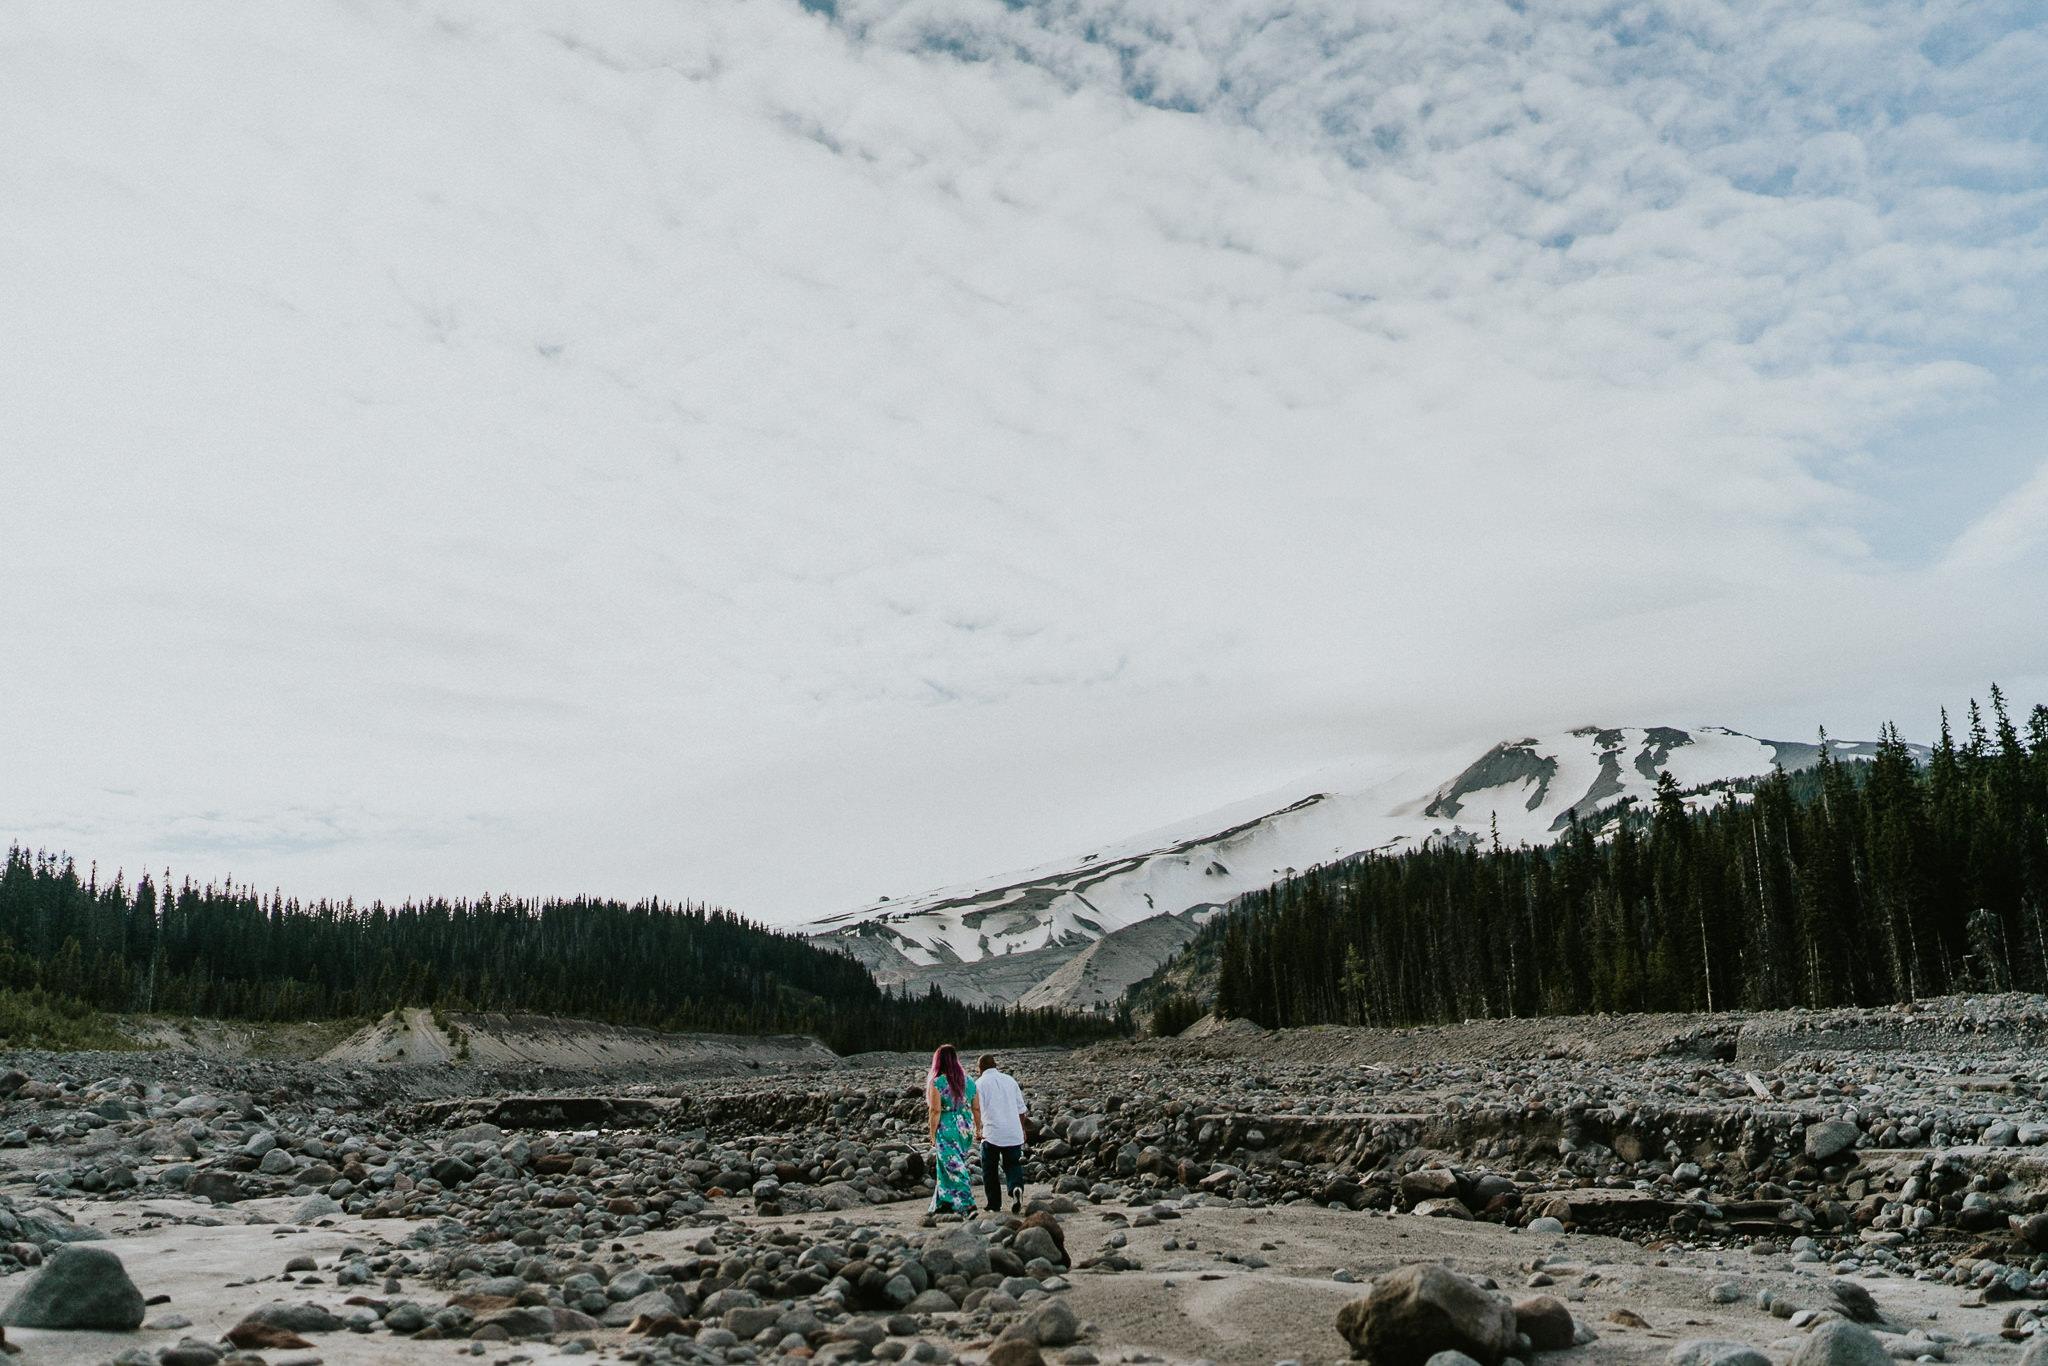 Mount-Hood-Sno-Park-Engagement-Session-Photographer